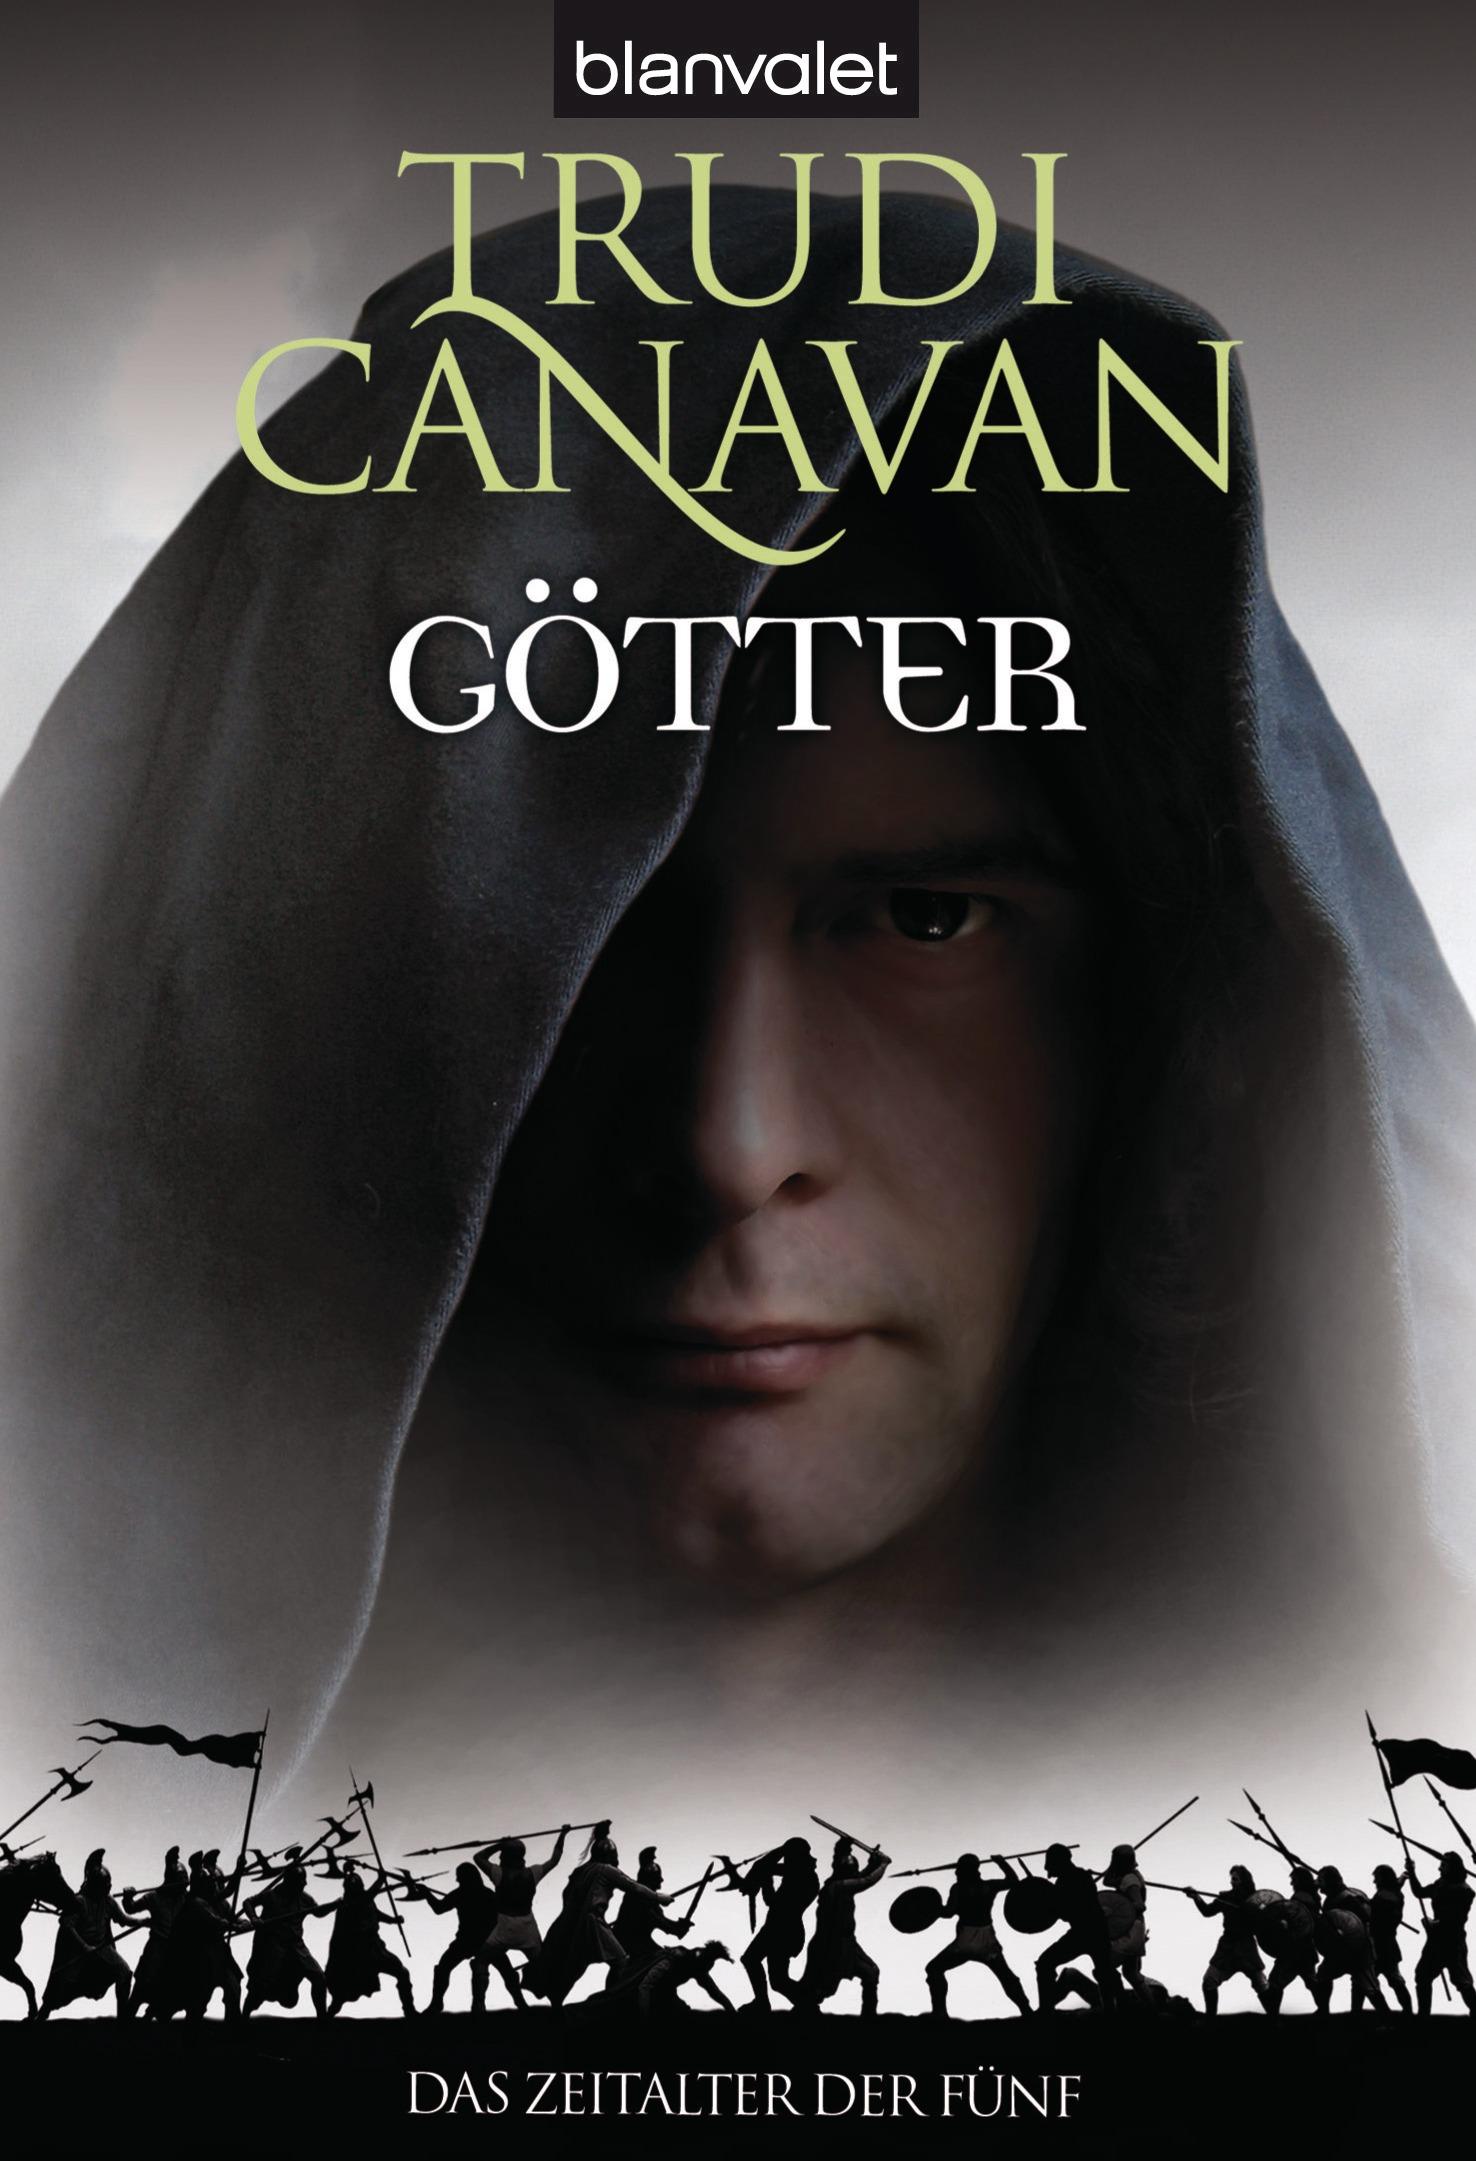 Götter. Das Zeitalter der Fünf 03 - Trudi Canavan